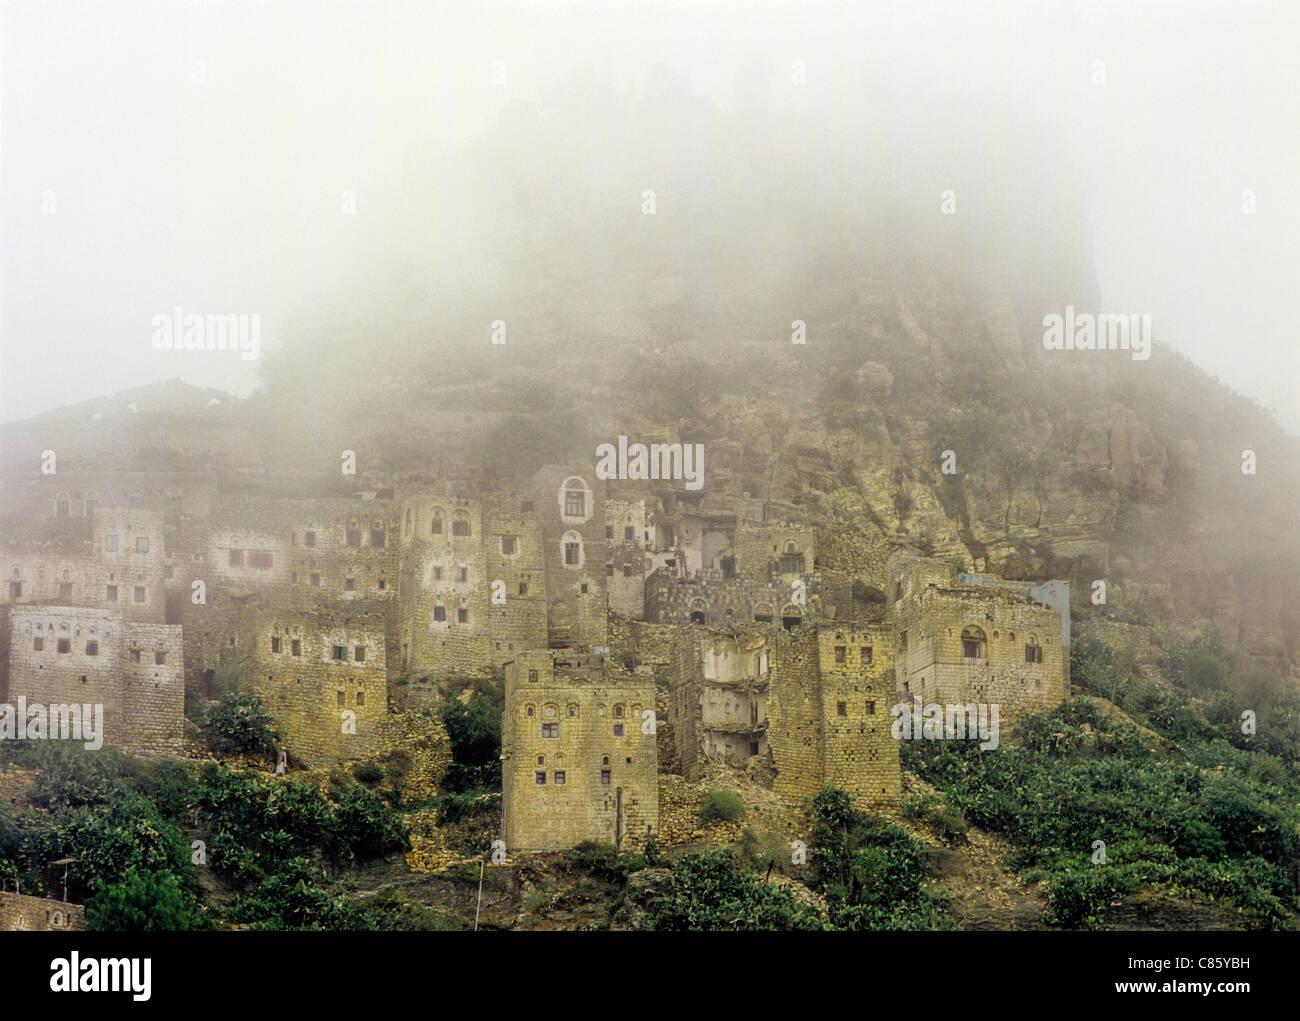 Fogged in town of mud brick multi-story buildings in Hajjah Governorate, Yemen - Stock Image